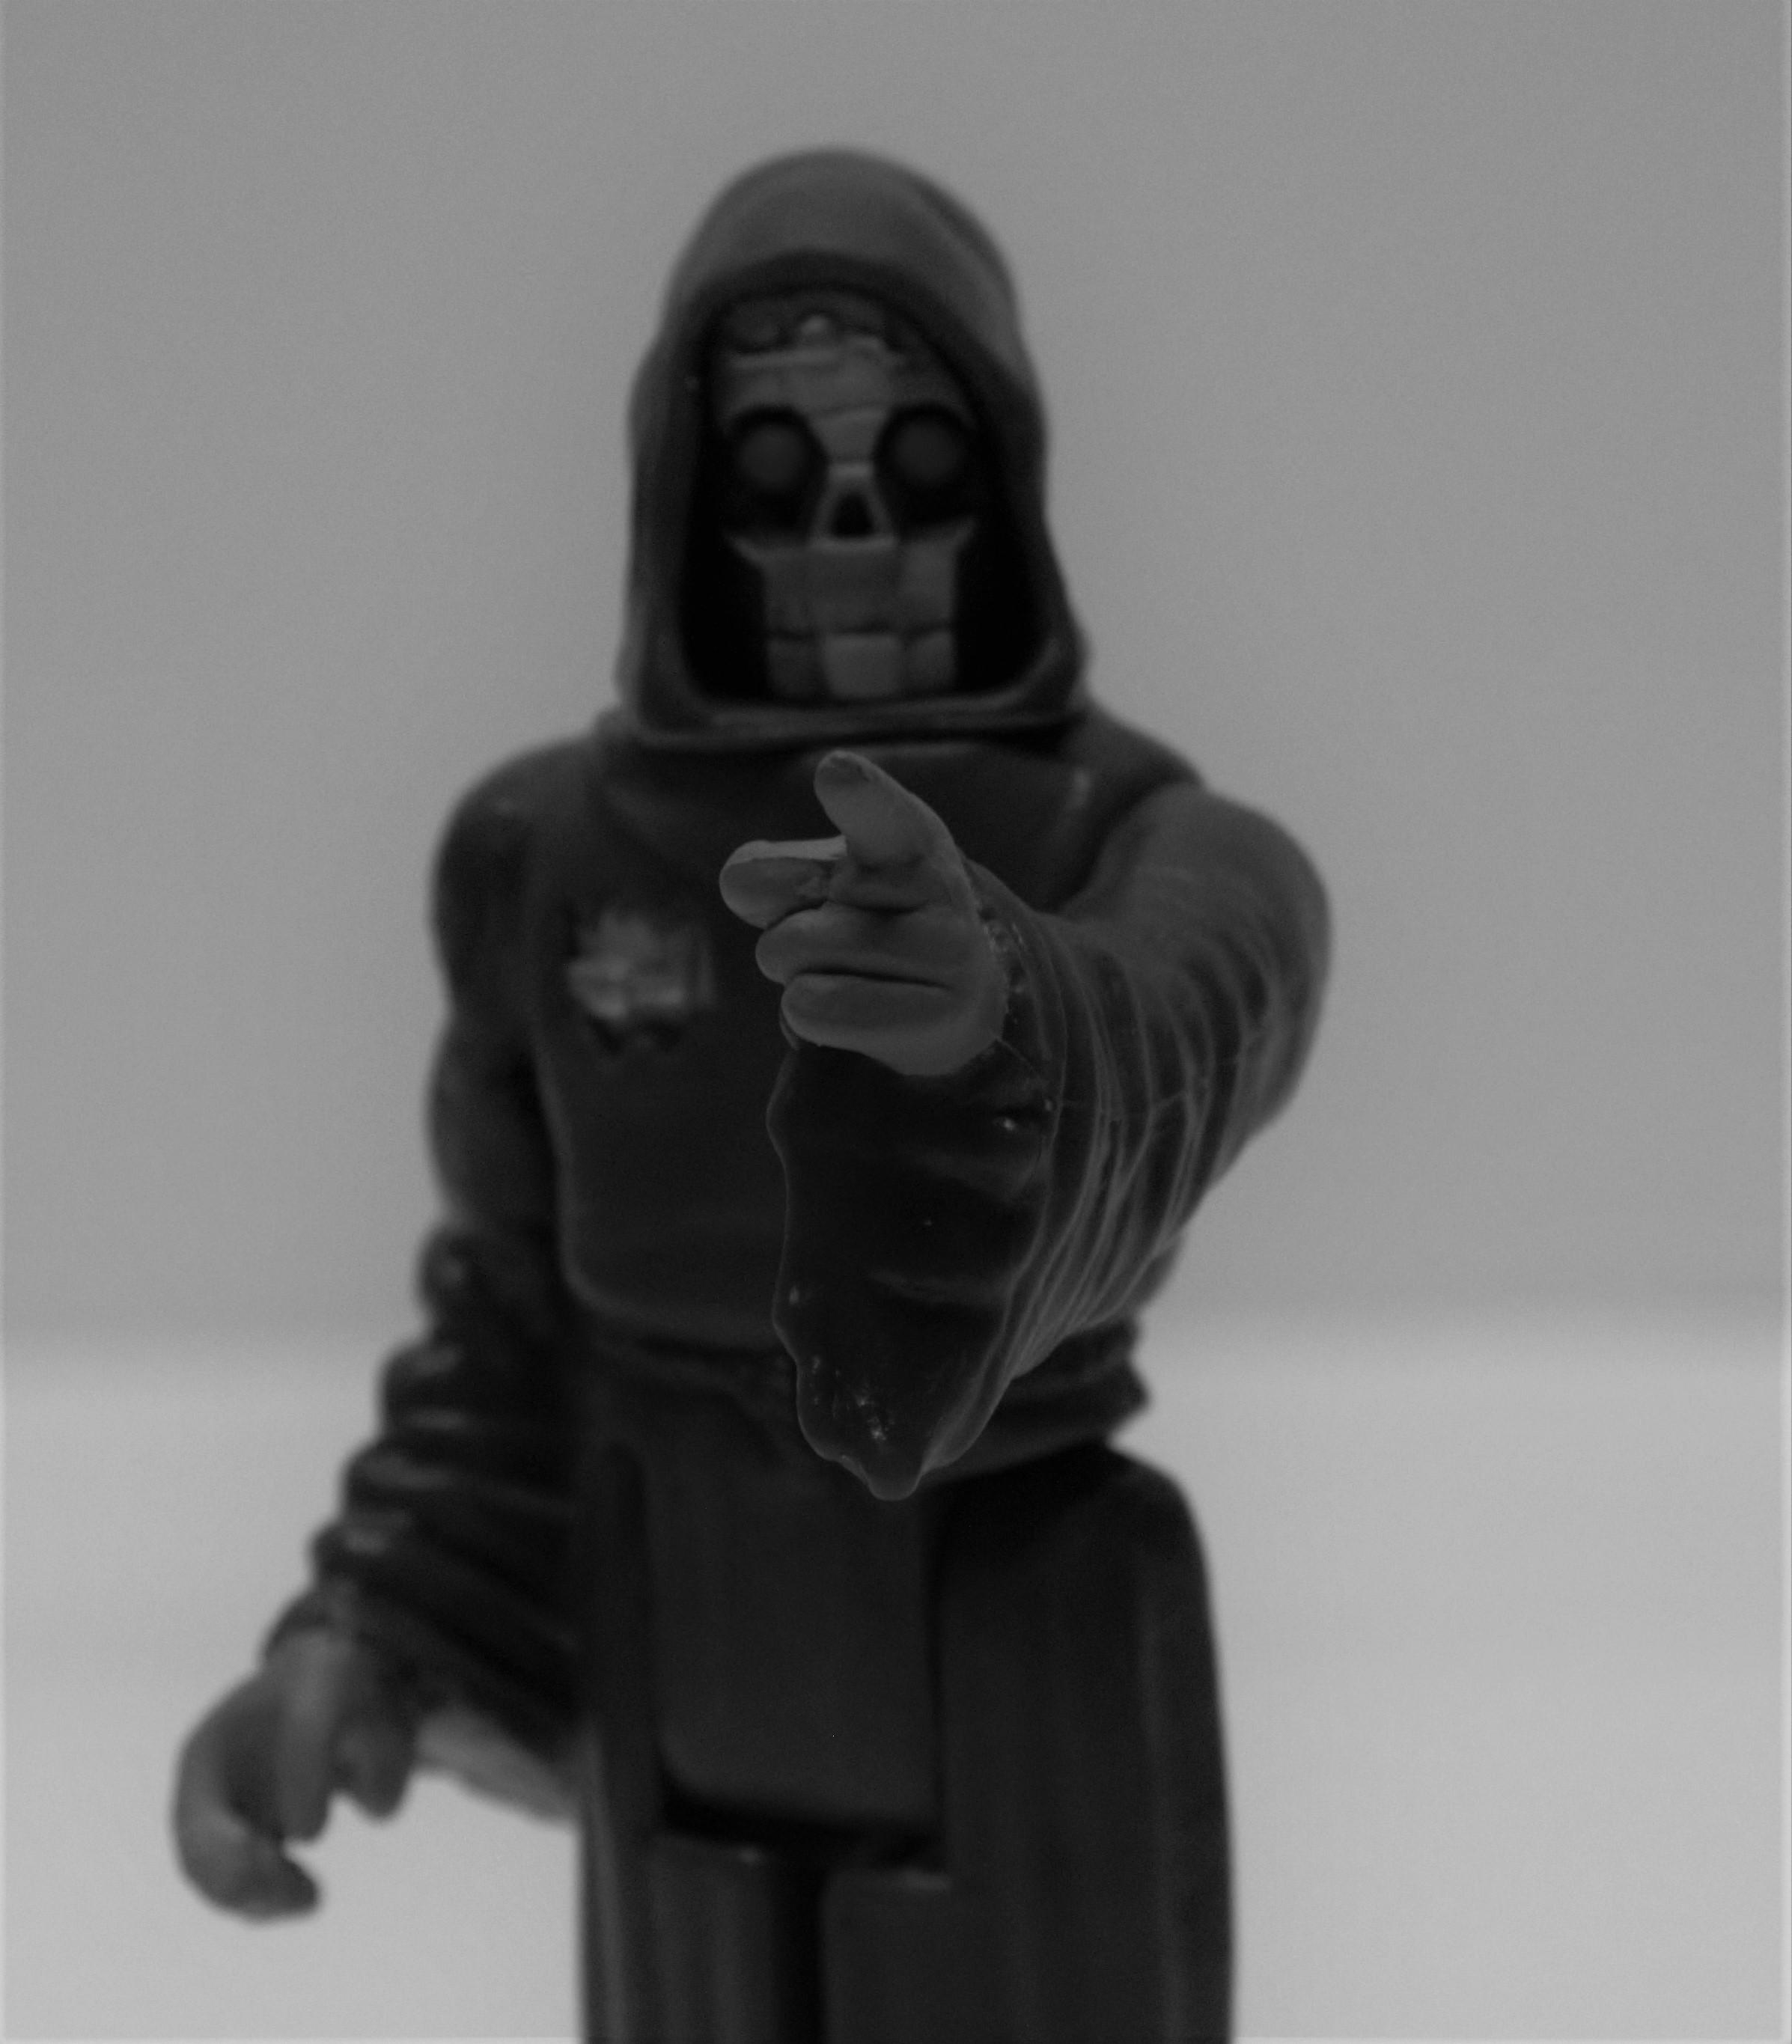 robot-reaper-8